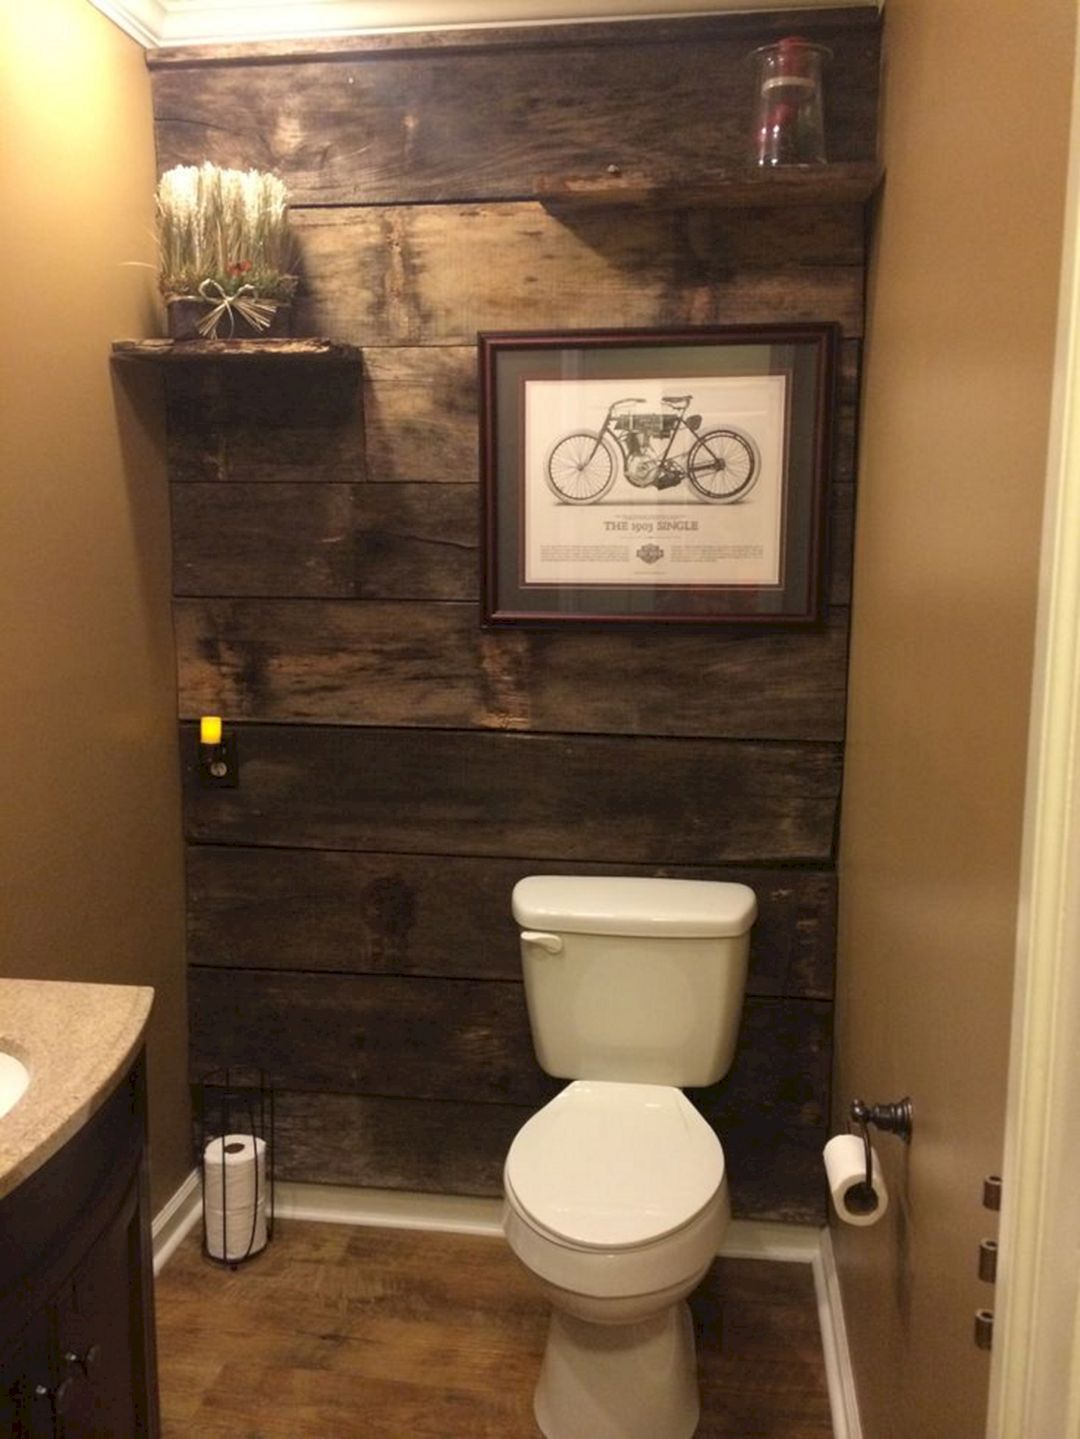 22 Ways To Boost And Refresh Your Bathroom By Adding Wood Accents: Barn Wood Bathroom, Cottage Bathroom Design Ideas, Rustic Bathrooms